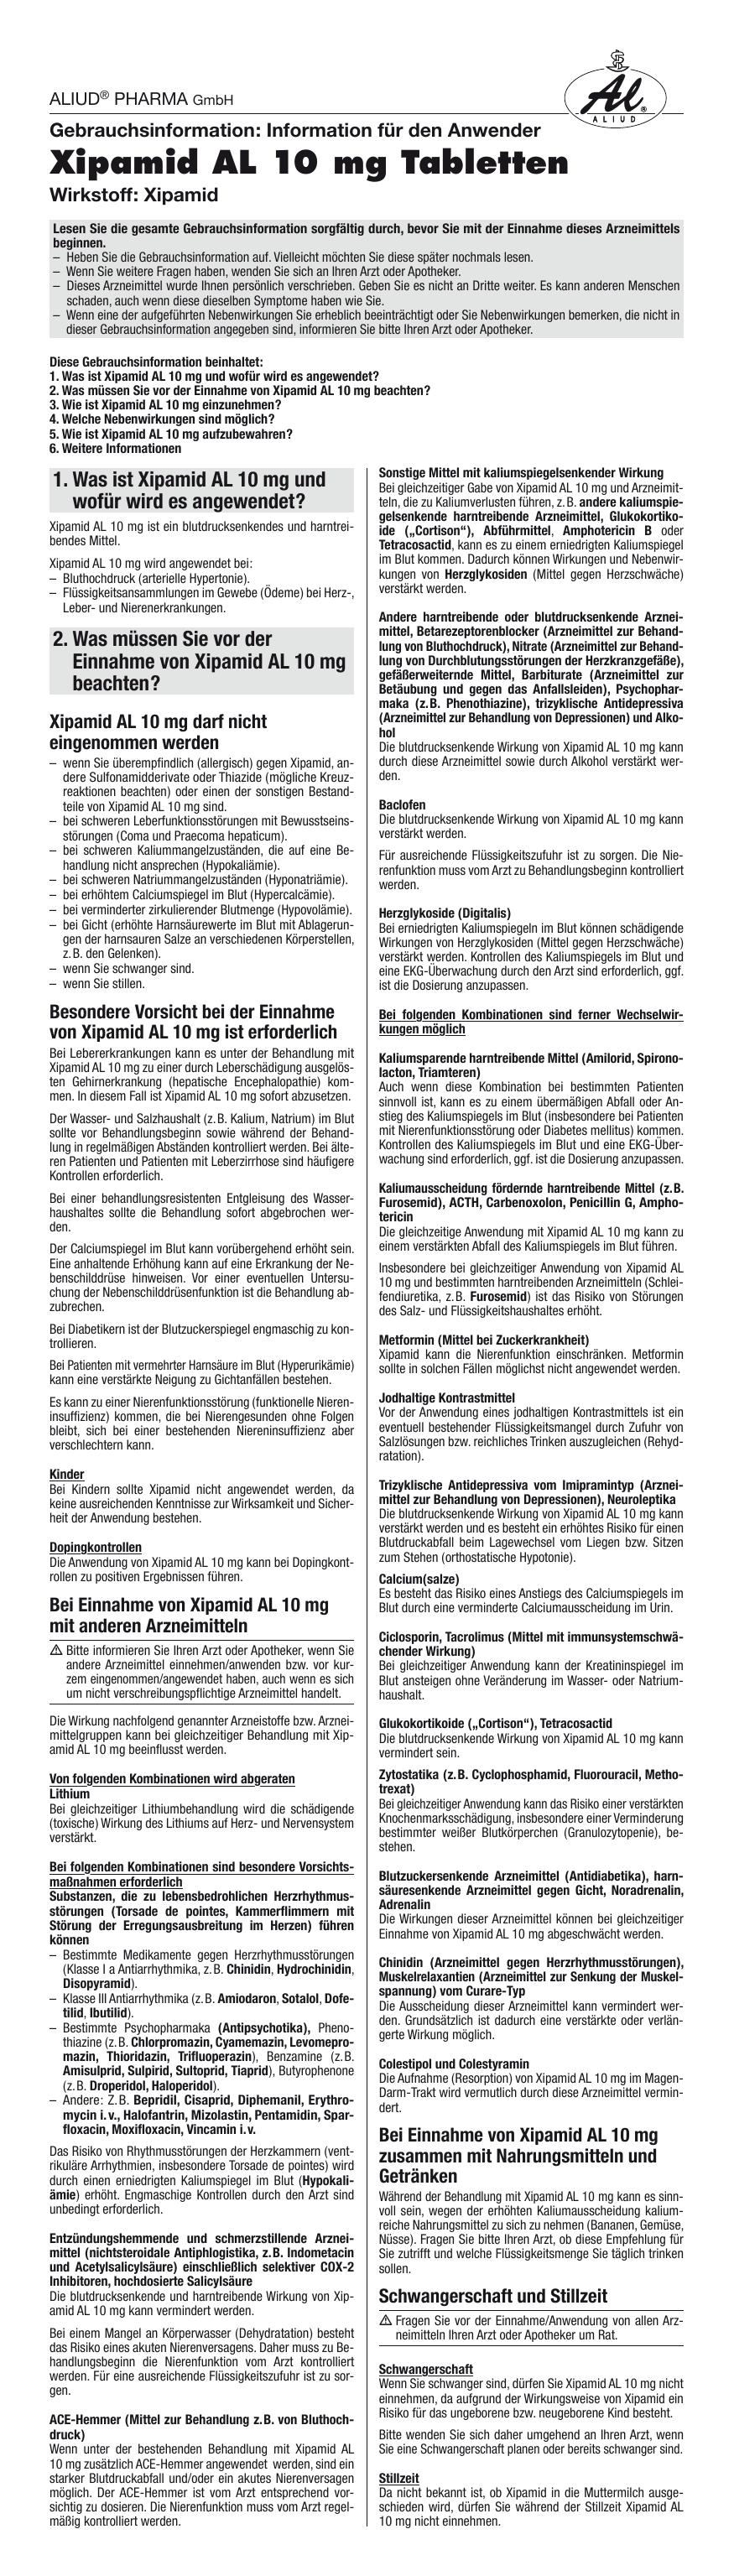 Xipamid AL 10 mg Tabletten - medikamente-per